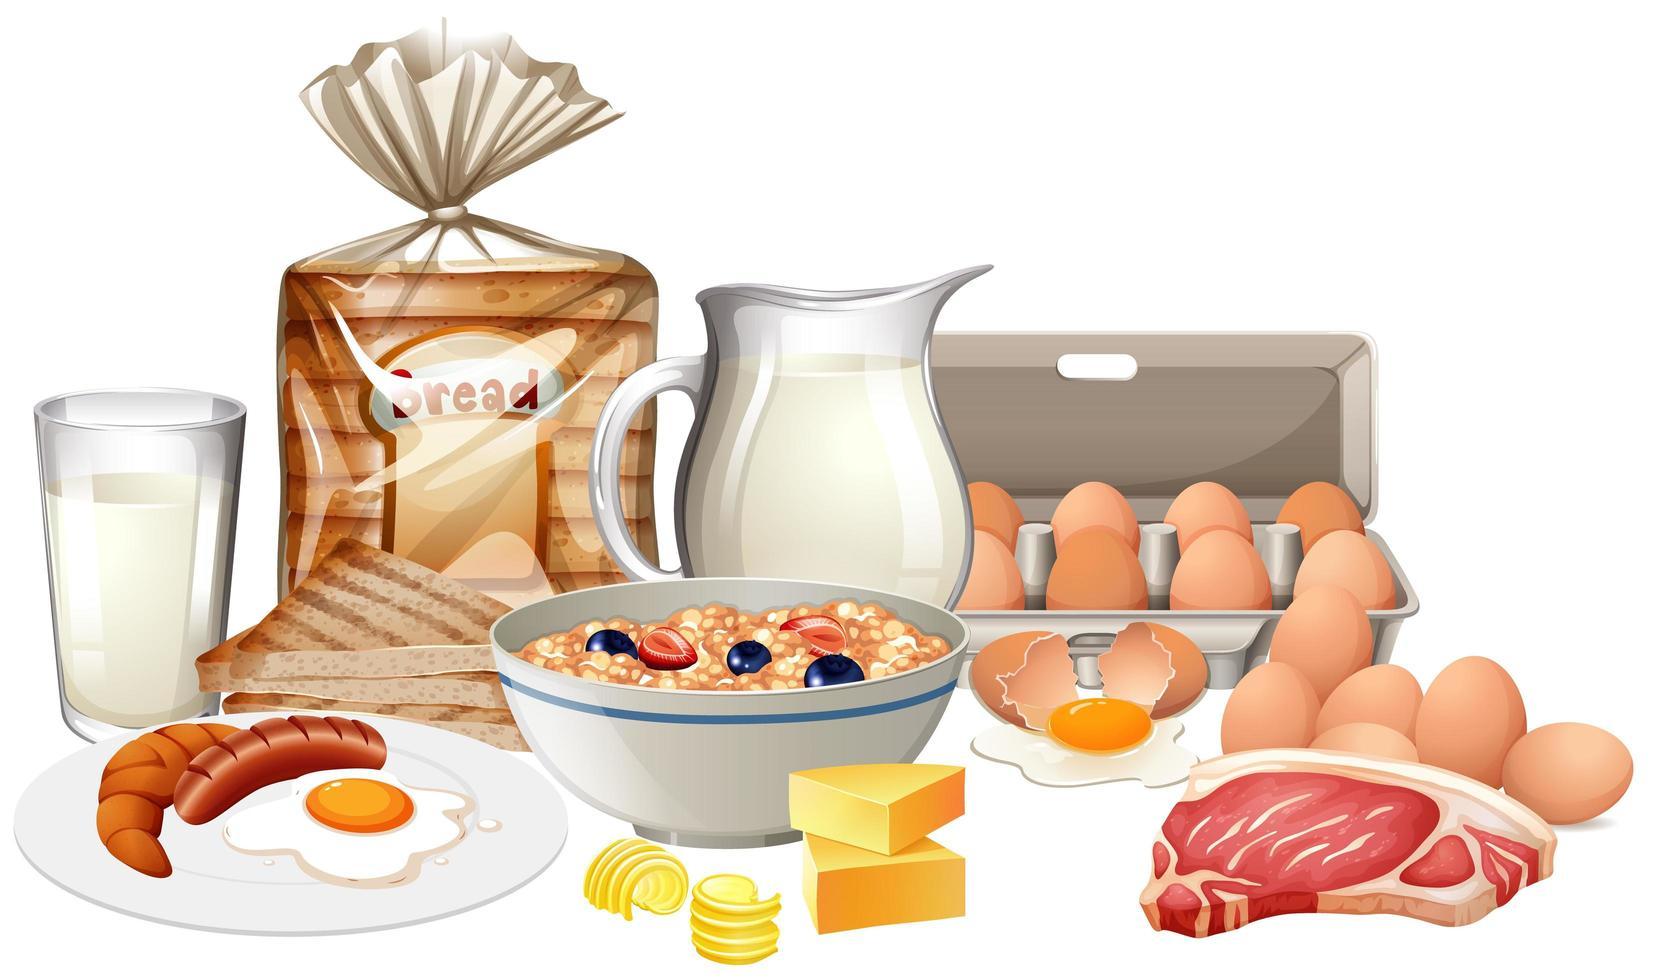 hälsosam frukost på vit bakgrund vektor